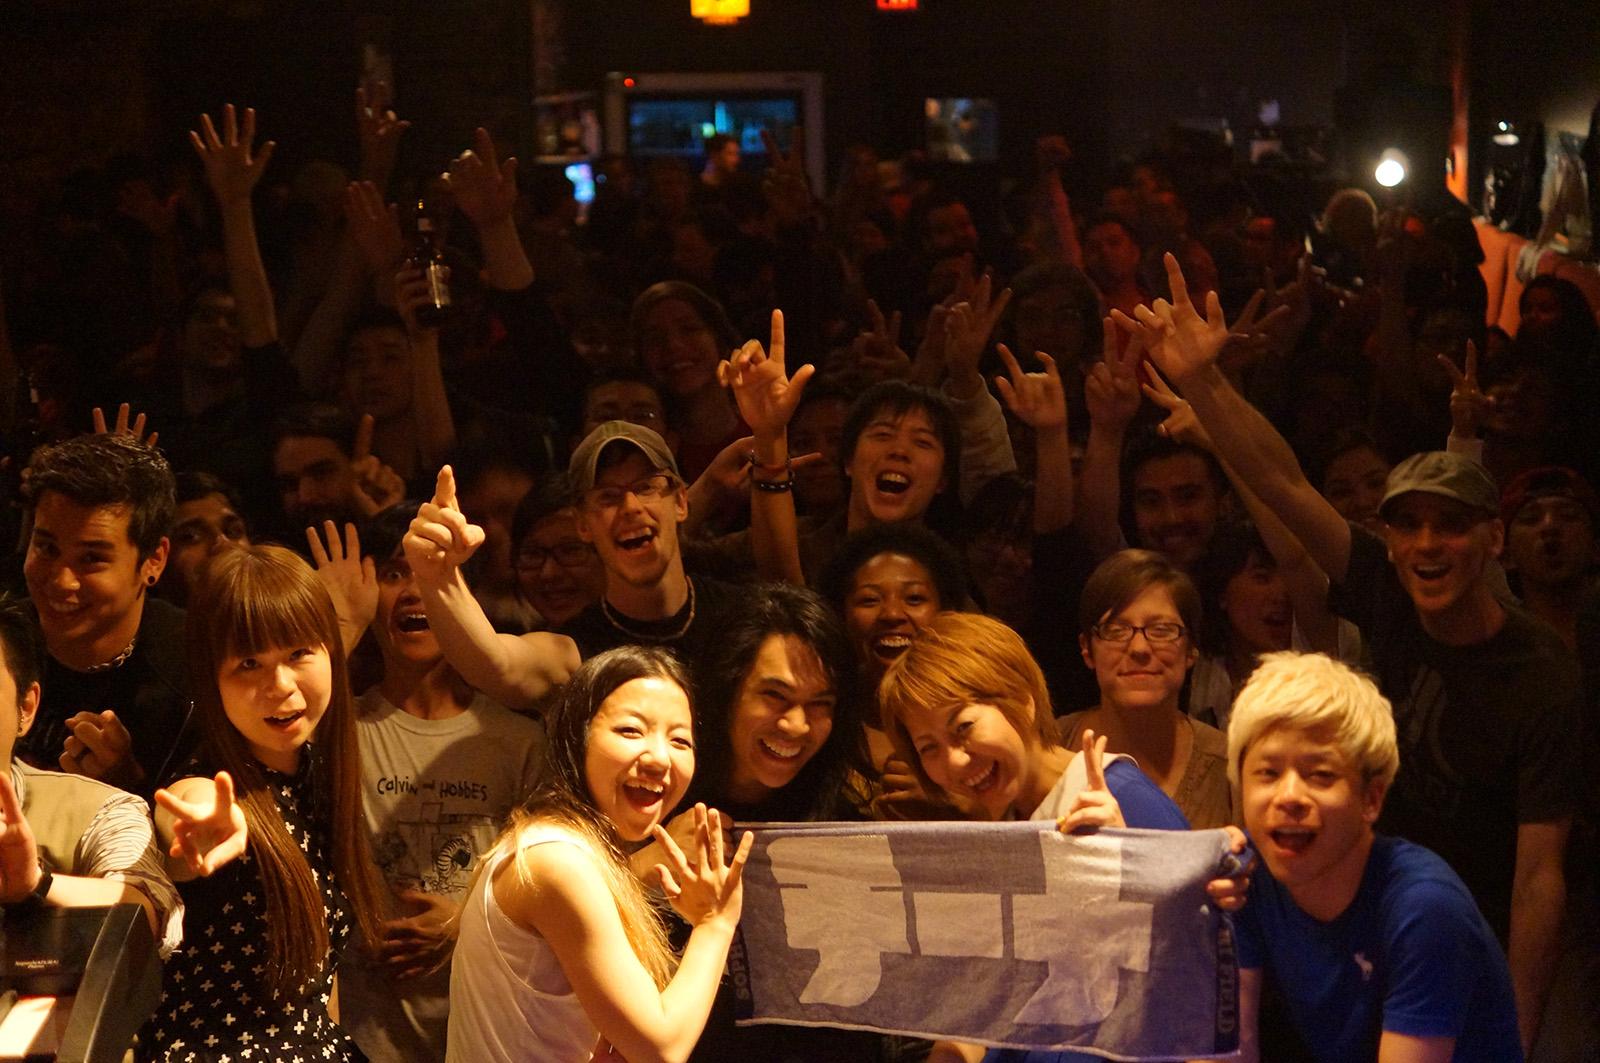 audience chiina